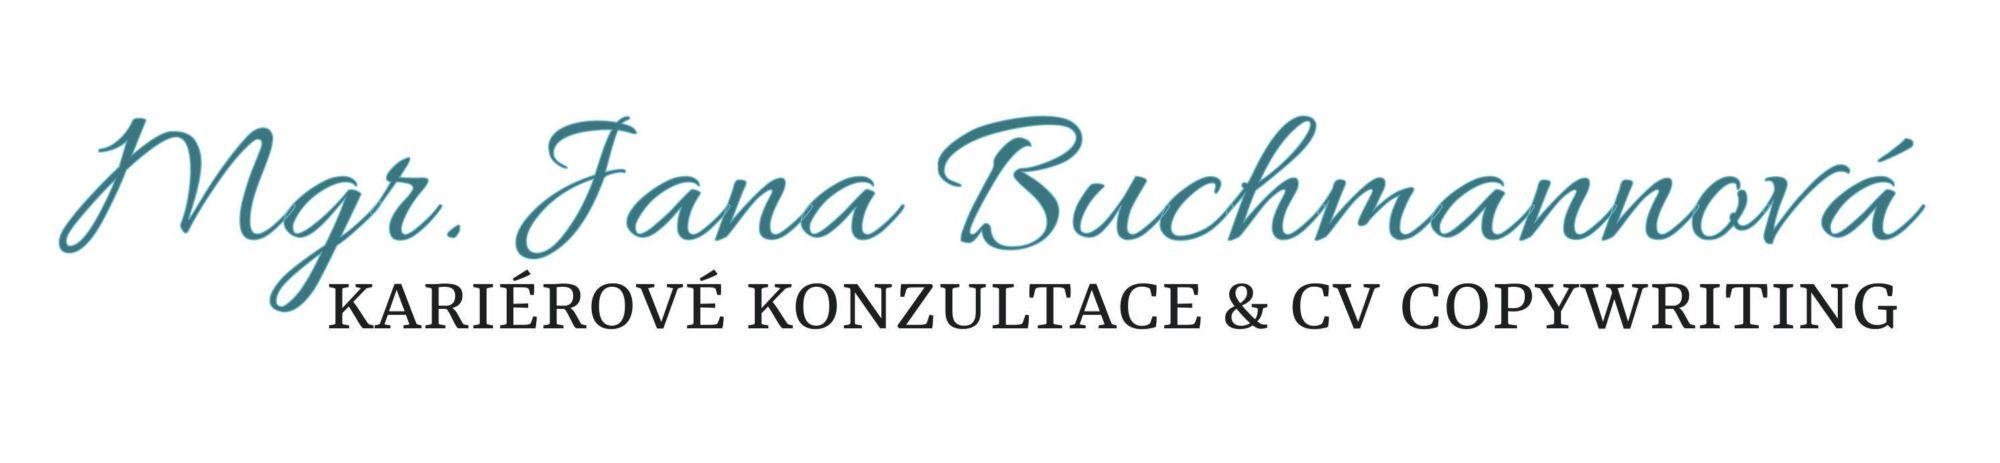 Mgr. Jana Buchmannová | Kariérové konzultace & CV copywriting